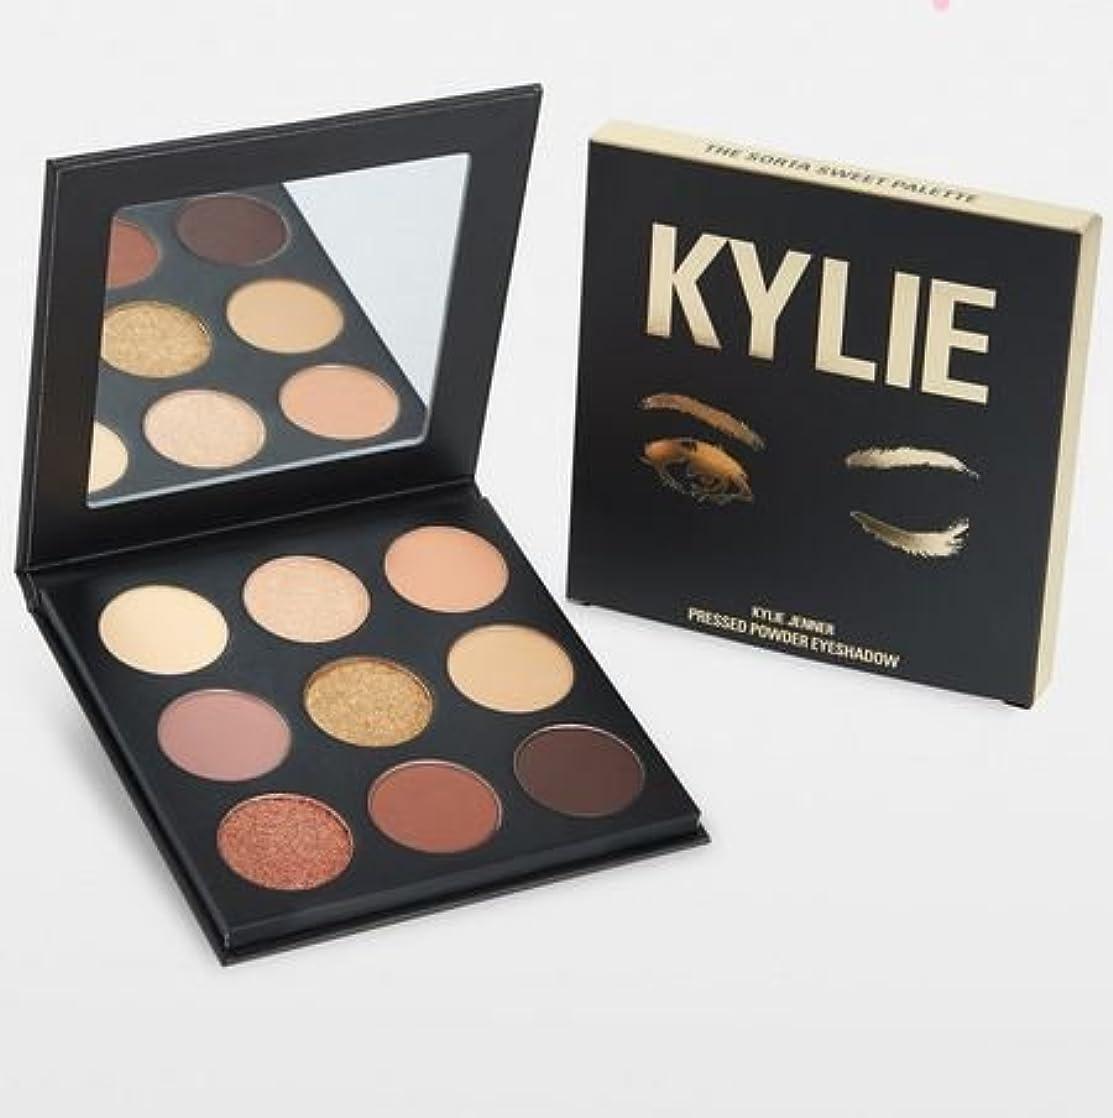 Kylie Cosmetics The Sorta Sweet Palette | Kyshadow カイリーコスメティックス